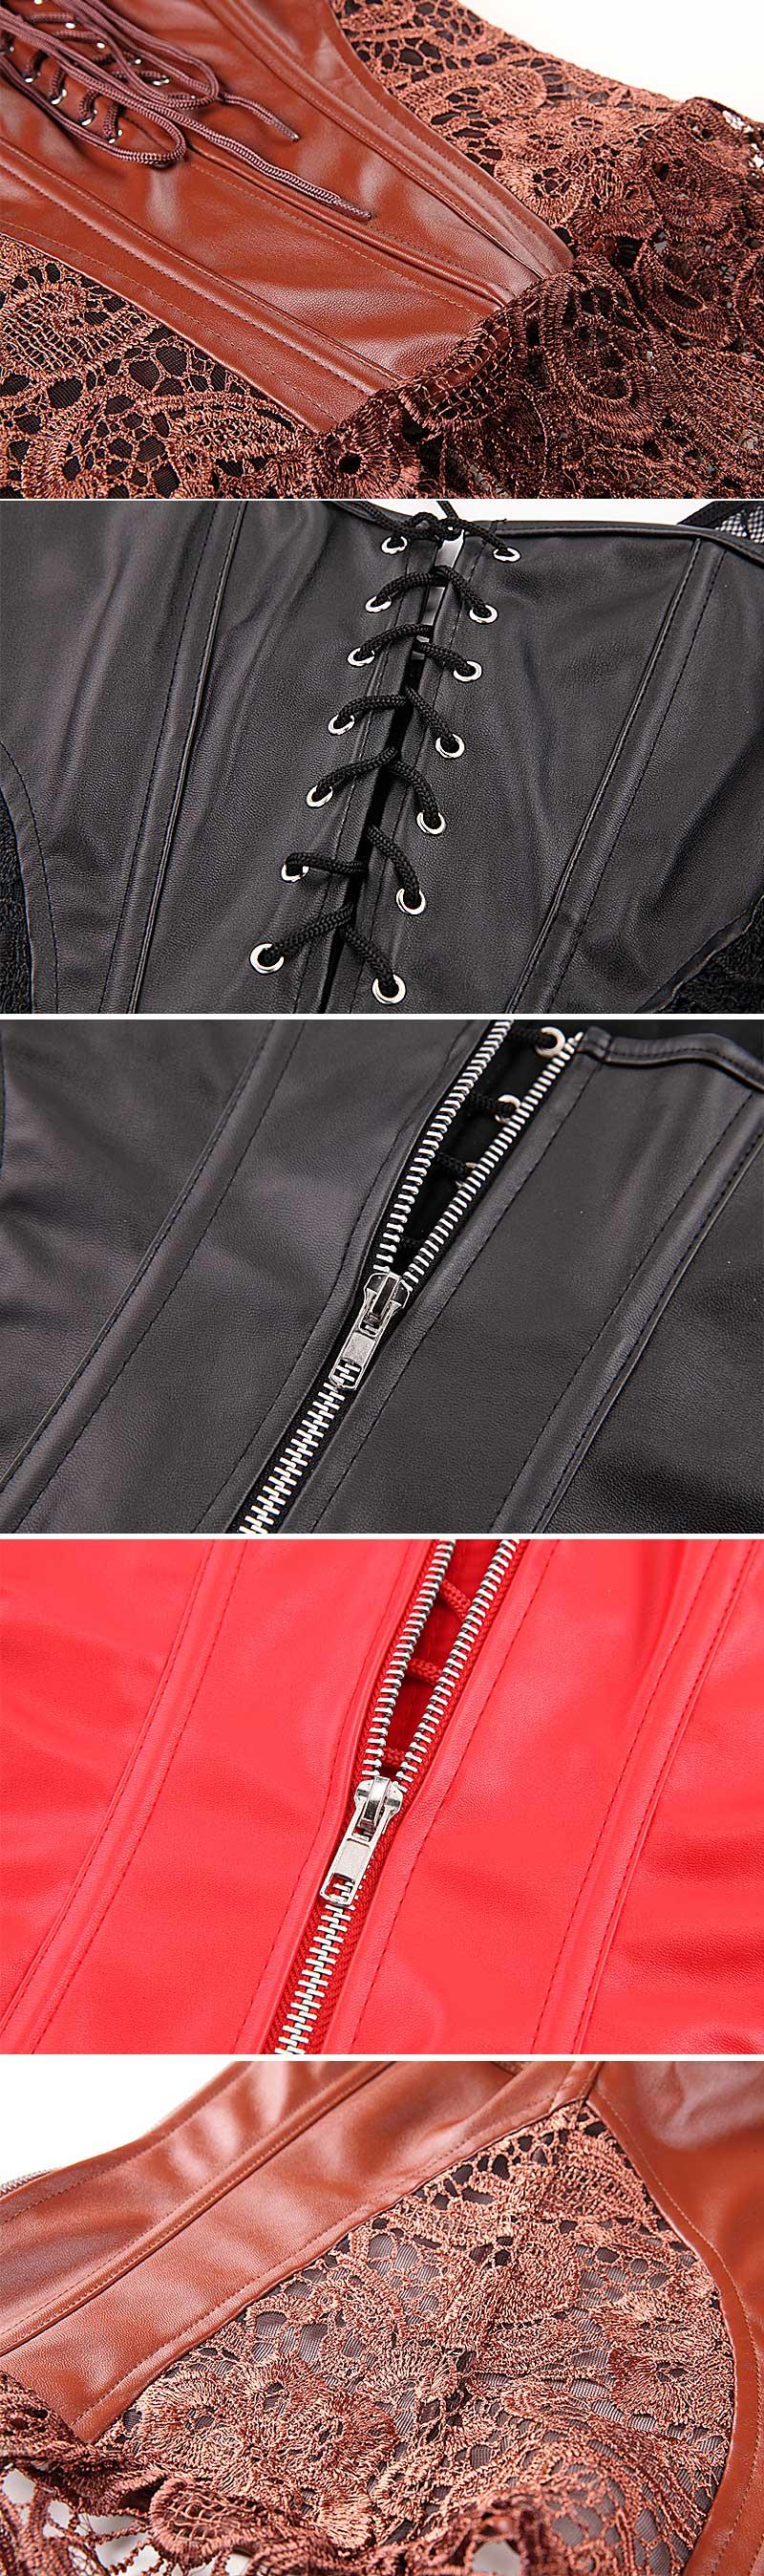 Corset Dress With Laciness Skirt Plus Size 6XL Steampunk Bustier Black Red Brown Corselet Faux Leather Outwear Dress Bone Korset 16